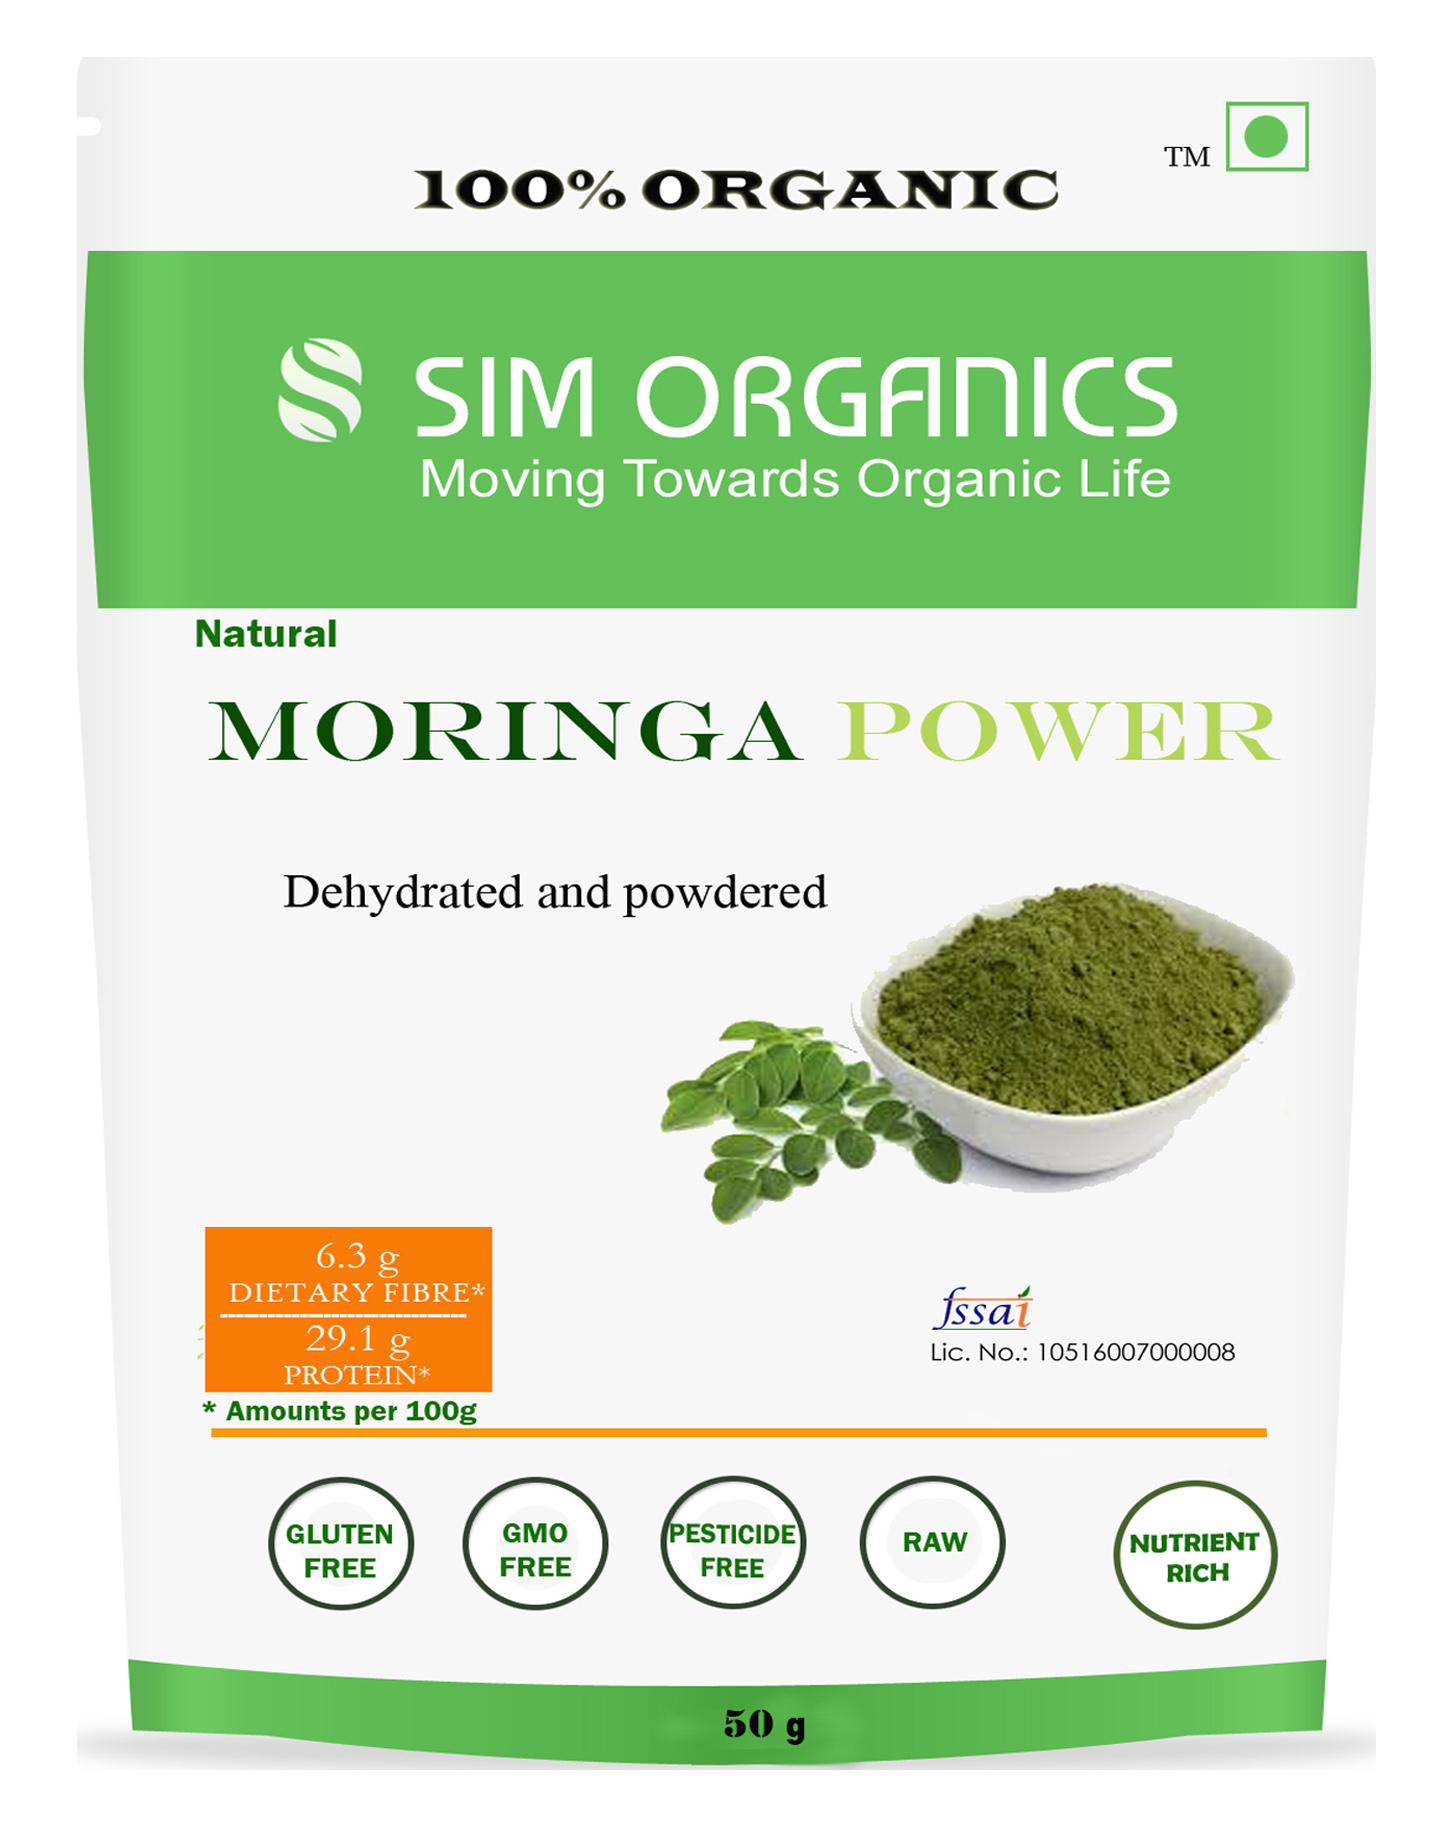 SIM Organics Moringa Podwer